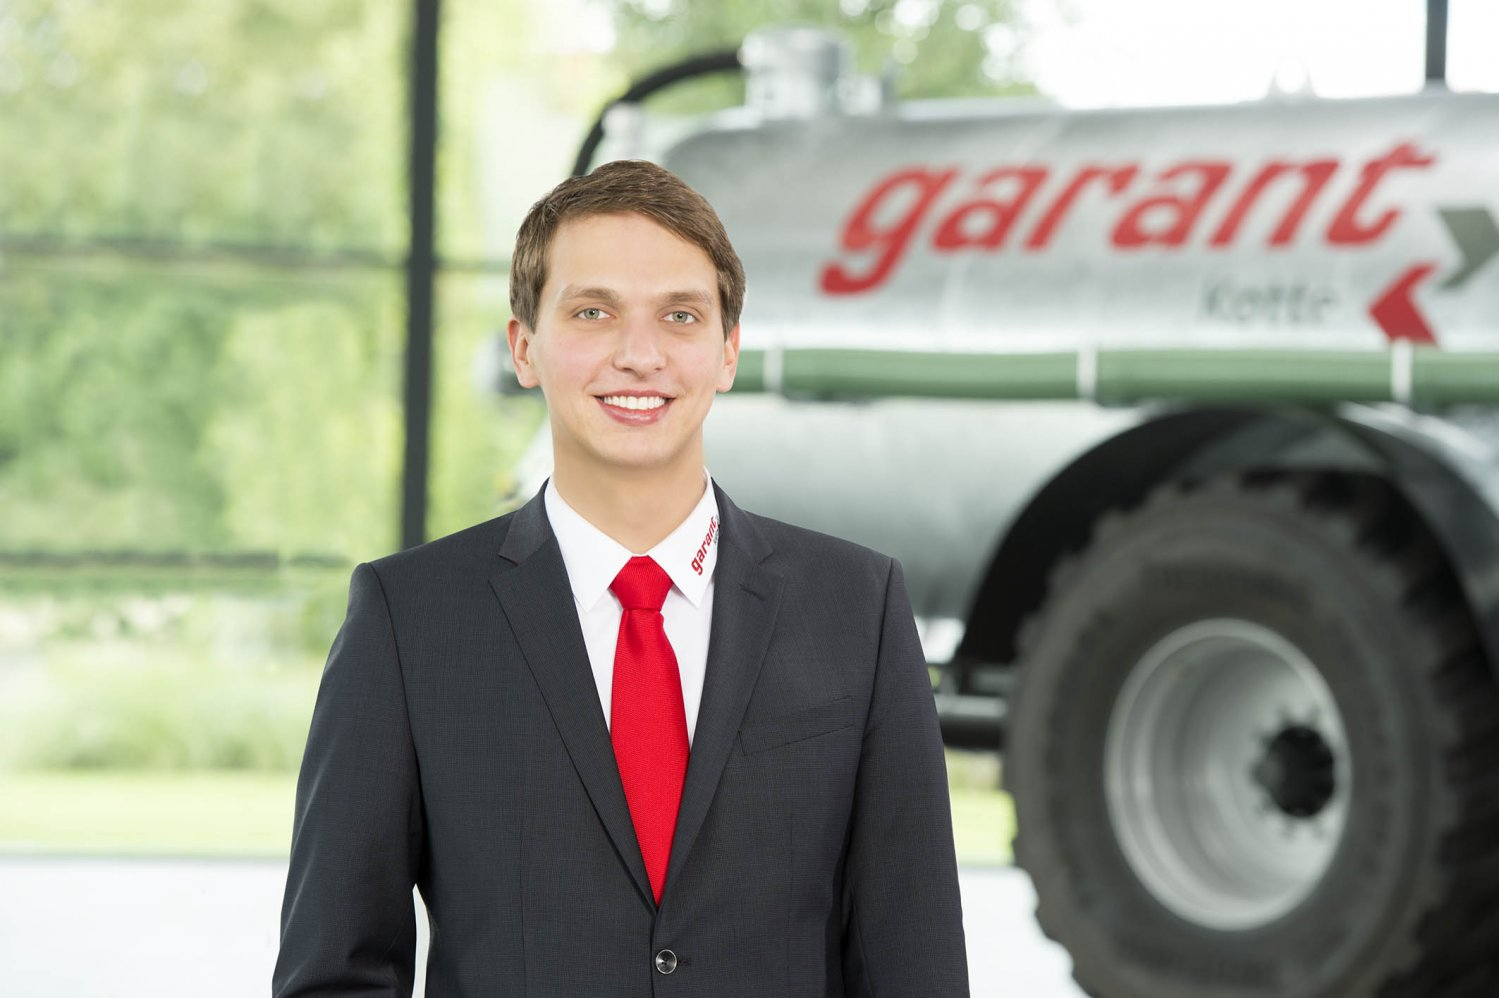 Gunnar Heineke